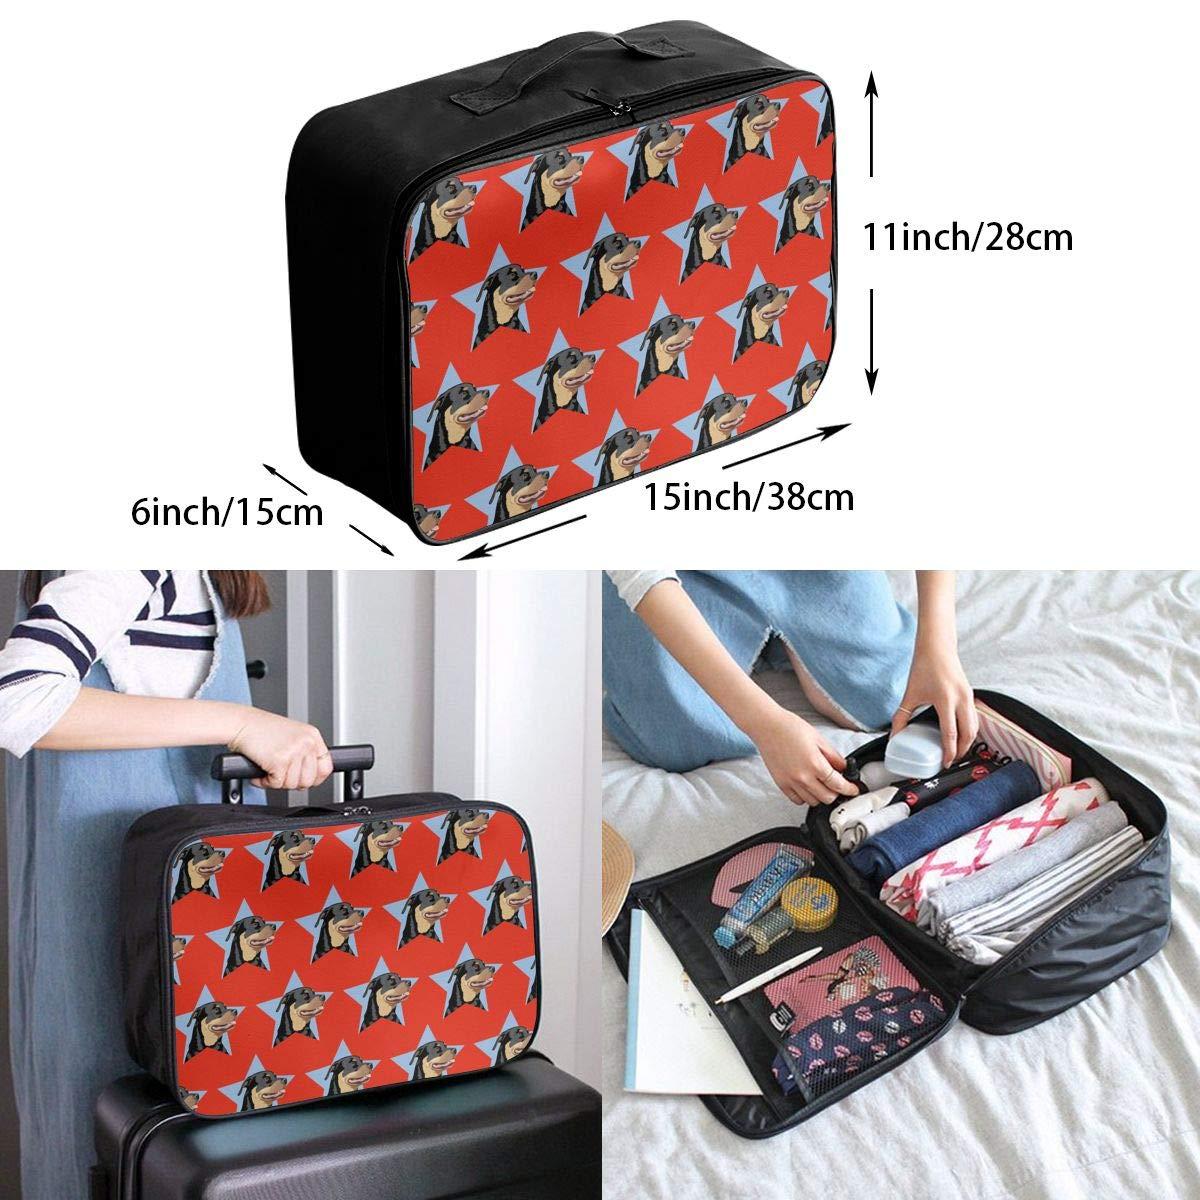 YueLJB Bernese Mountain Dog Lightweight Large Capacity Portable Luggage Bag Travel Duffel Bag Storage Carry Luggage Duffle Tote Bag